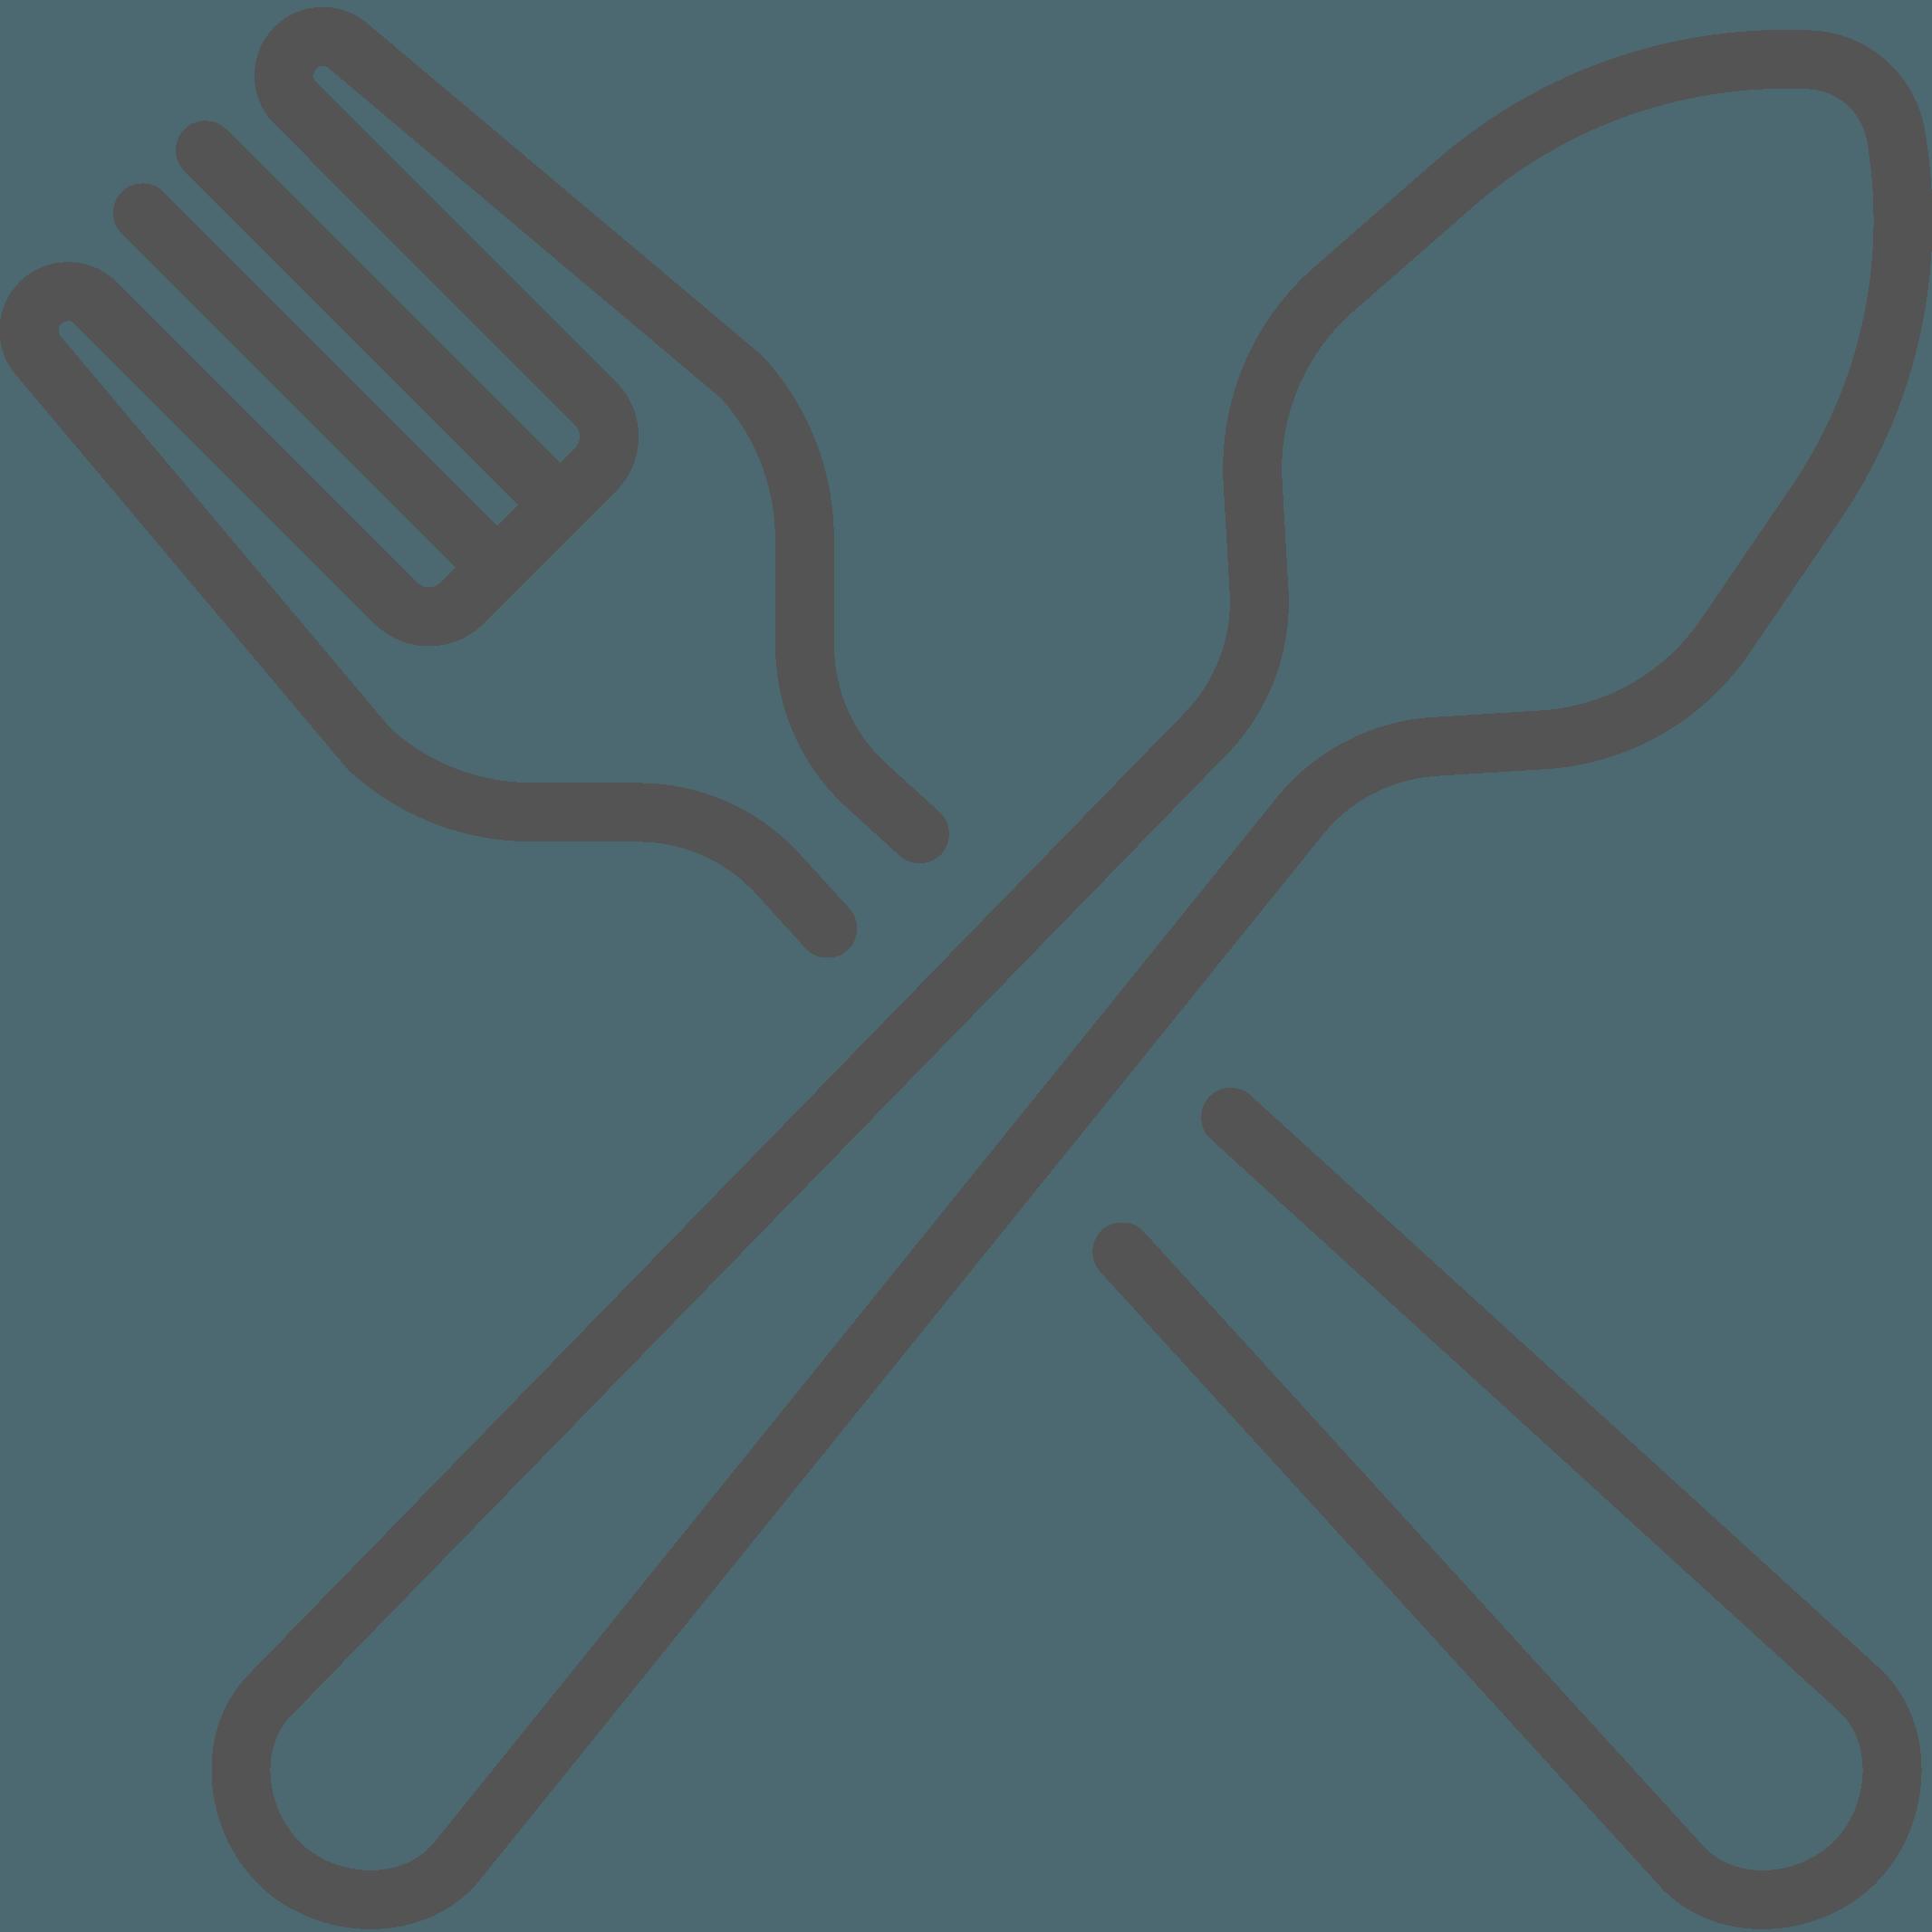 Spa Suite-Home de Briançon Serre-Chevalier - Chambre Spa Suite-Home de Briançon Serre-Chevalier - Restaurants